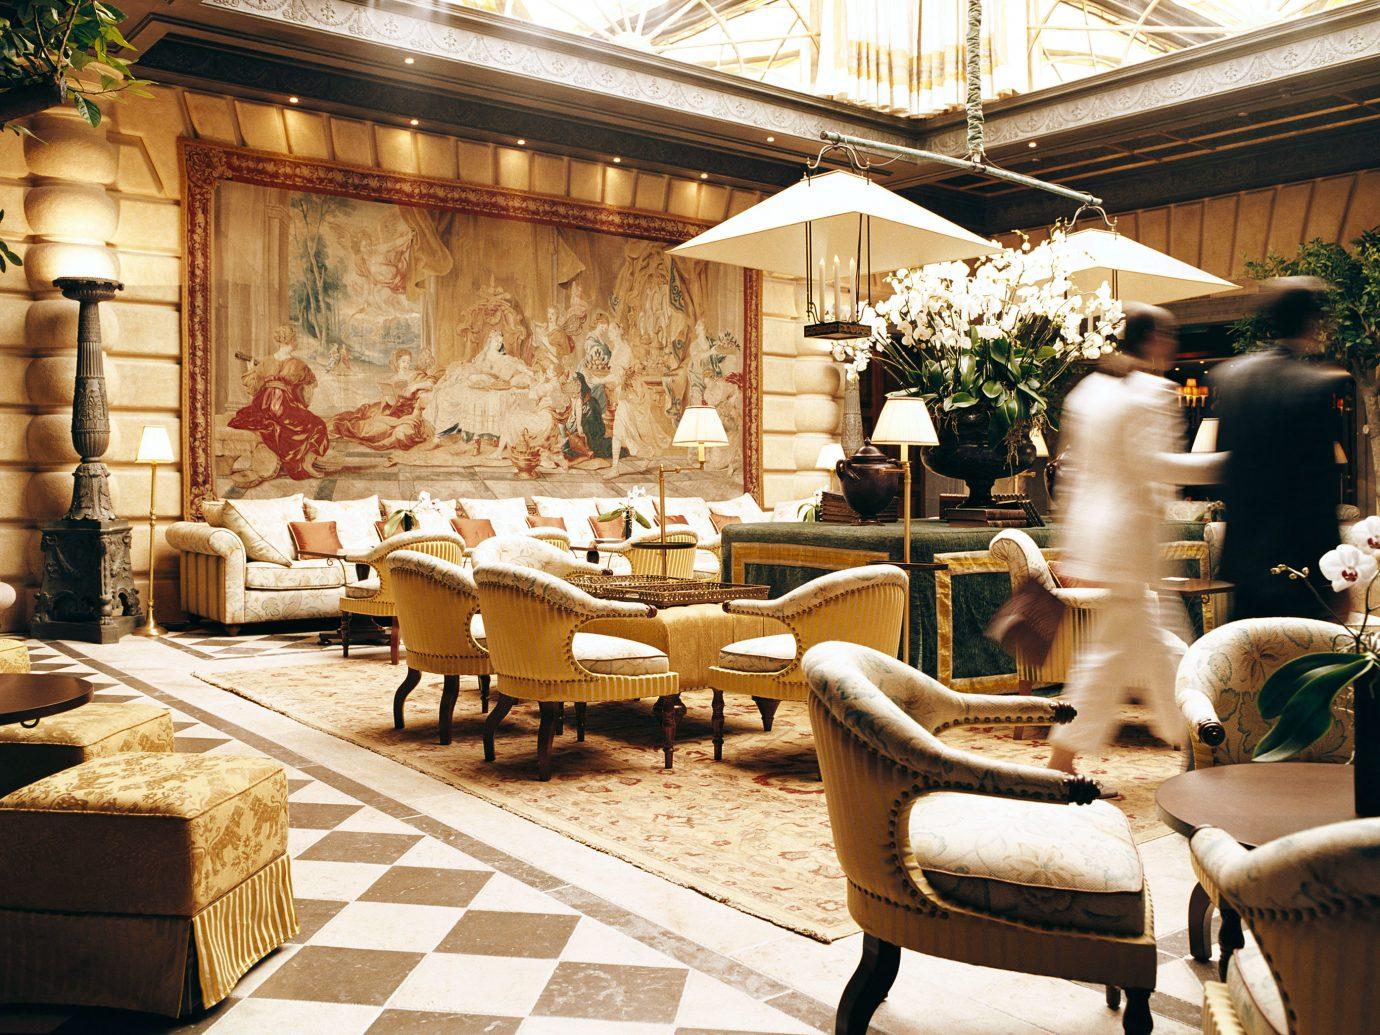 Bar Dining Drink Eat Elegant Hotels Luxury Luxury Travel Travel Tips Trip Ideas Lobby room living room estate interior design home furniture Design restaurant window covering several